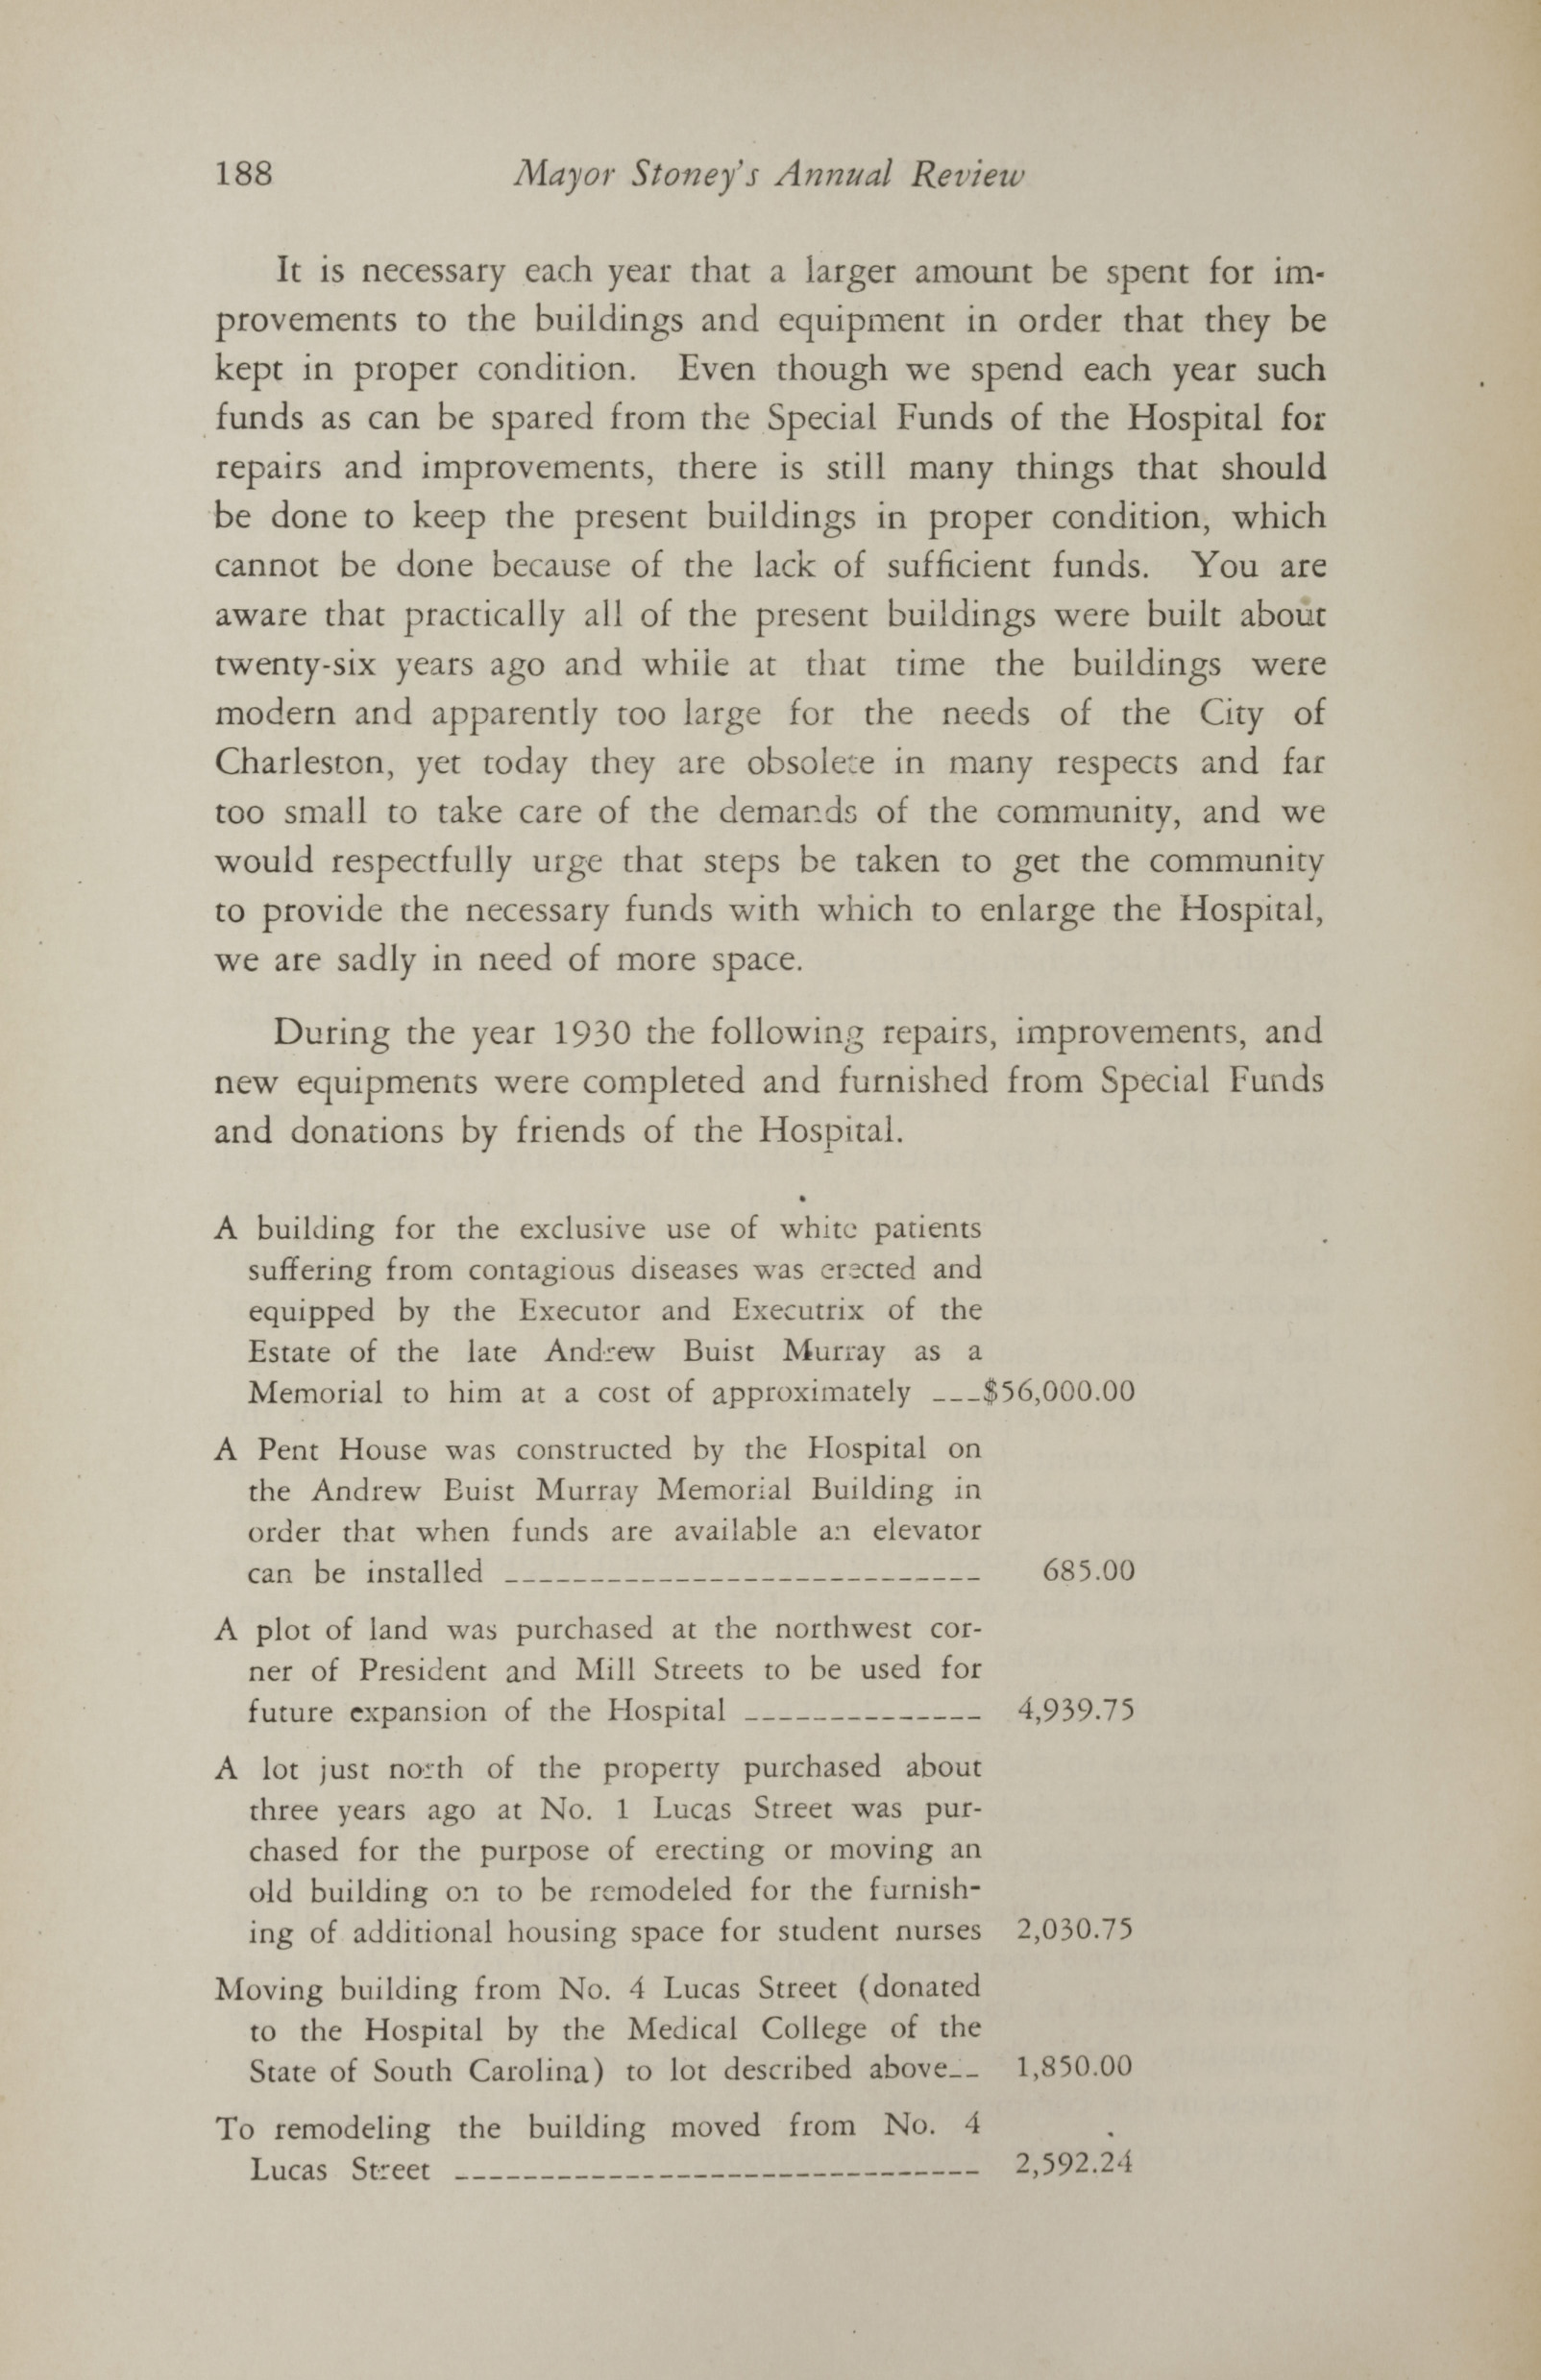 Charleston Yearbook, 1930, page 188